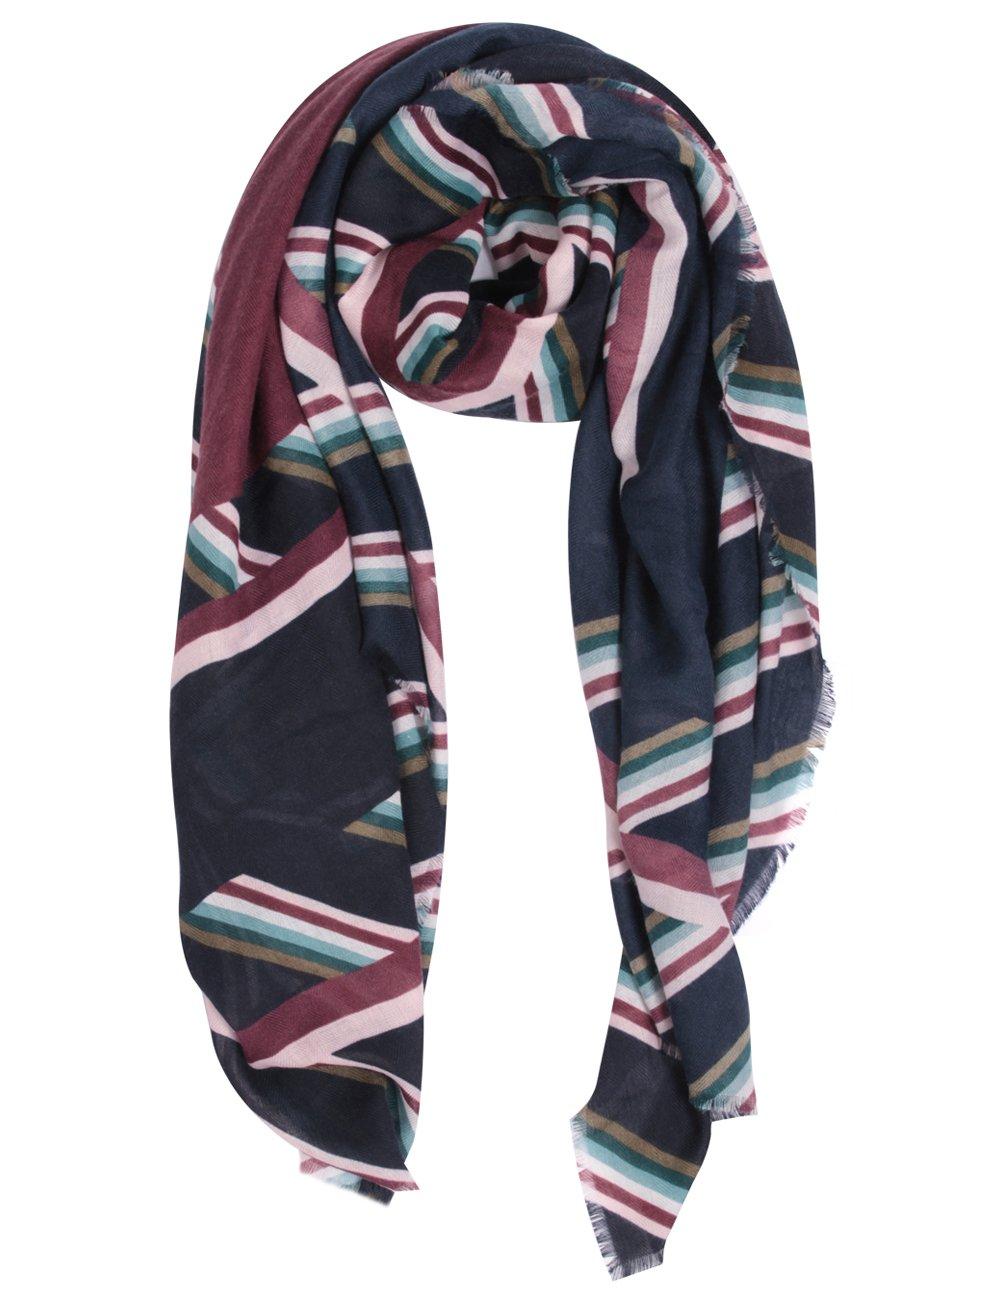 Summer Scarves, KELLY KLARK Women's Fashion Scarves Beach Scarves Multicoloured